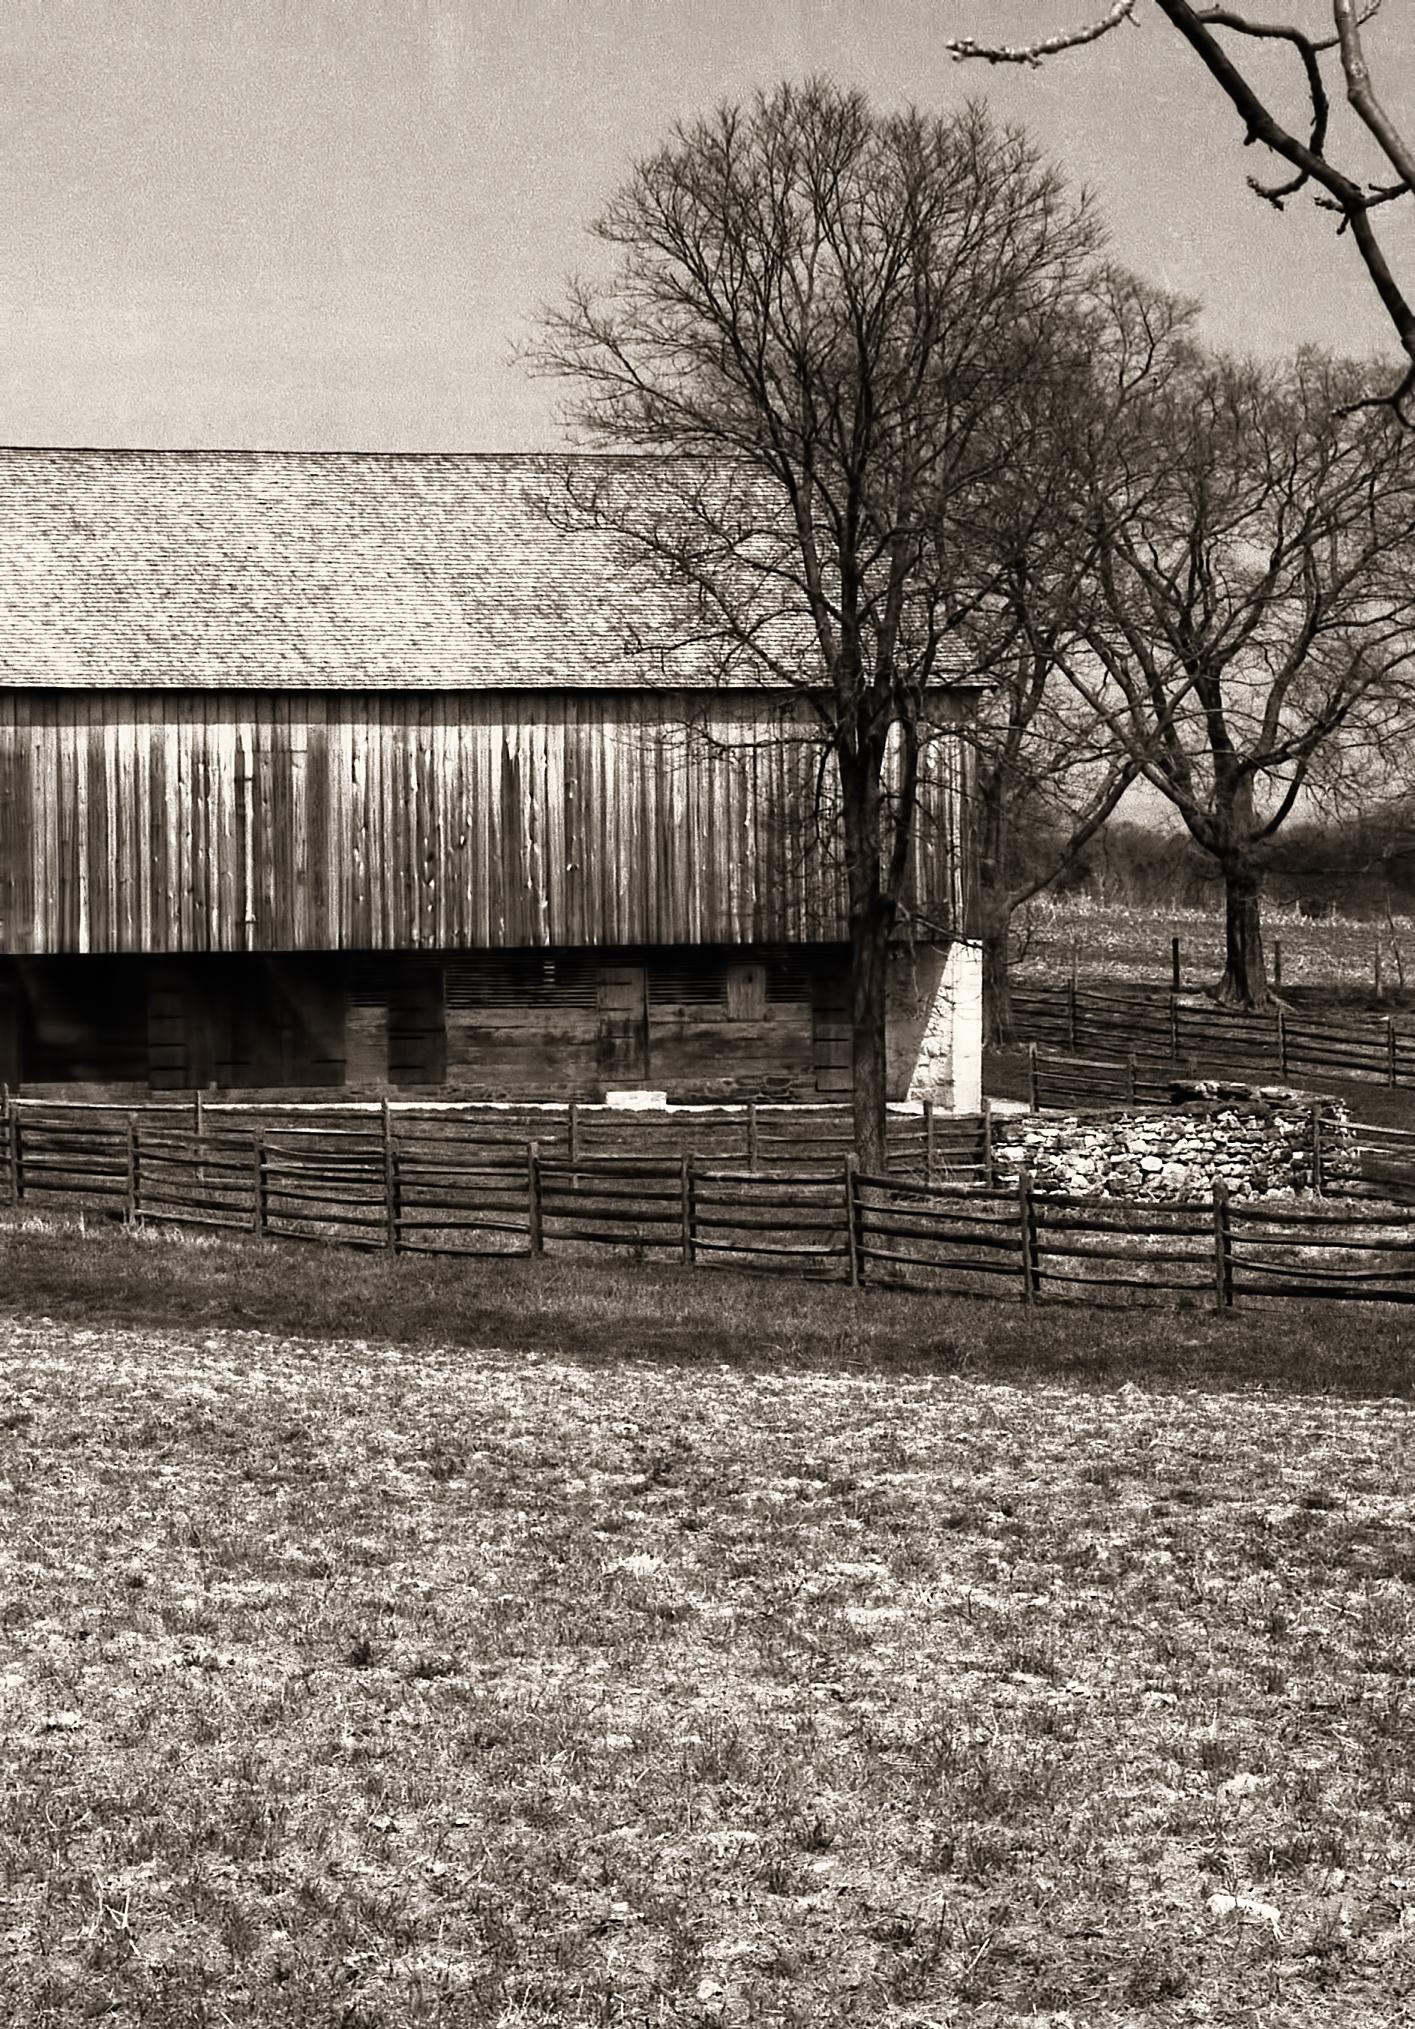 4x5_for_365_project_0106_Antietam_Poffenberger_barn.jpg